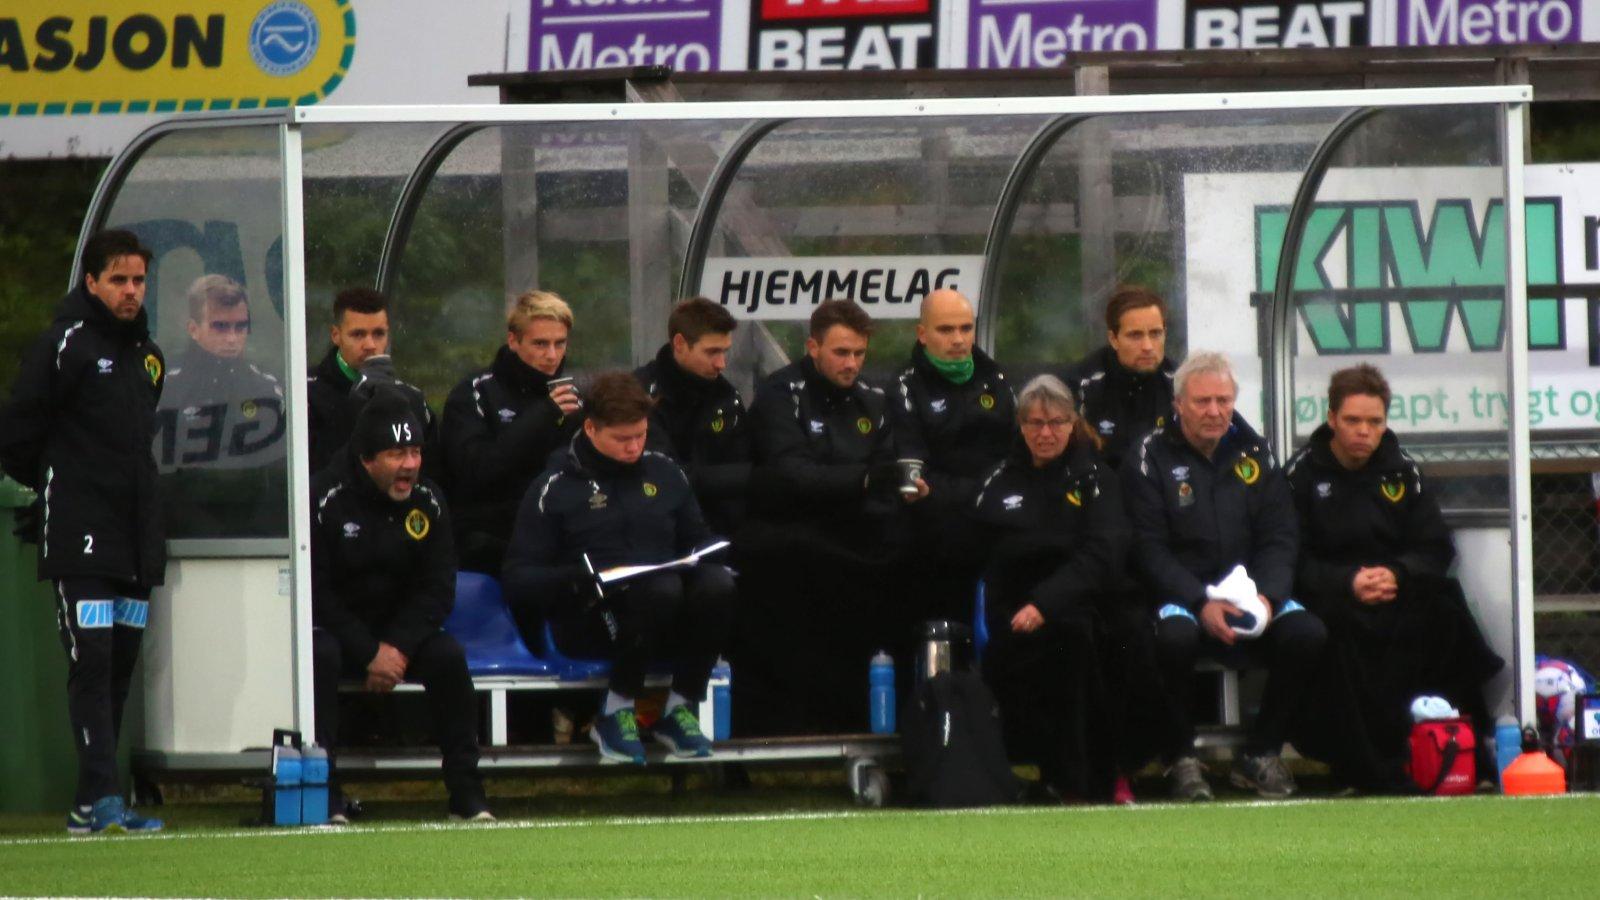 Ull/Kisa-benken under den 29. serierunden mot Jerv på Jessheim stadion.